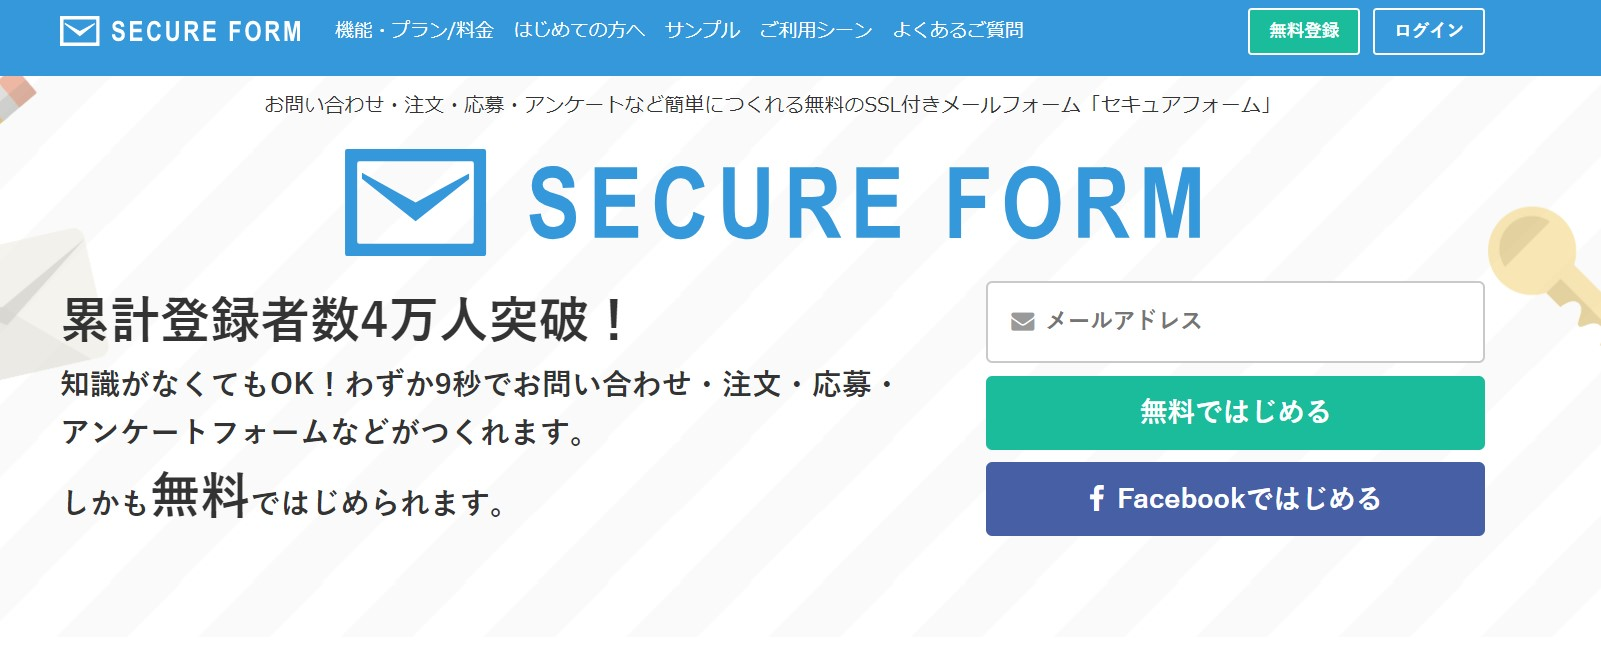 img_secureform.jpeg